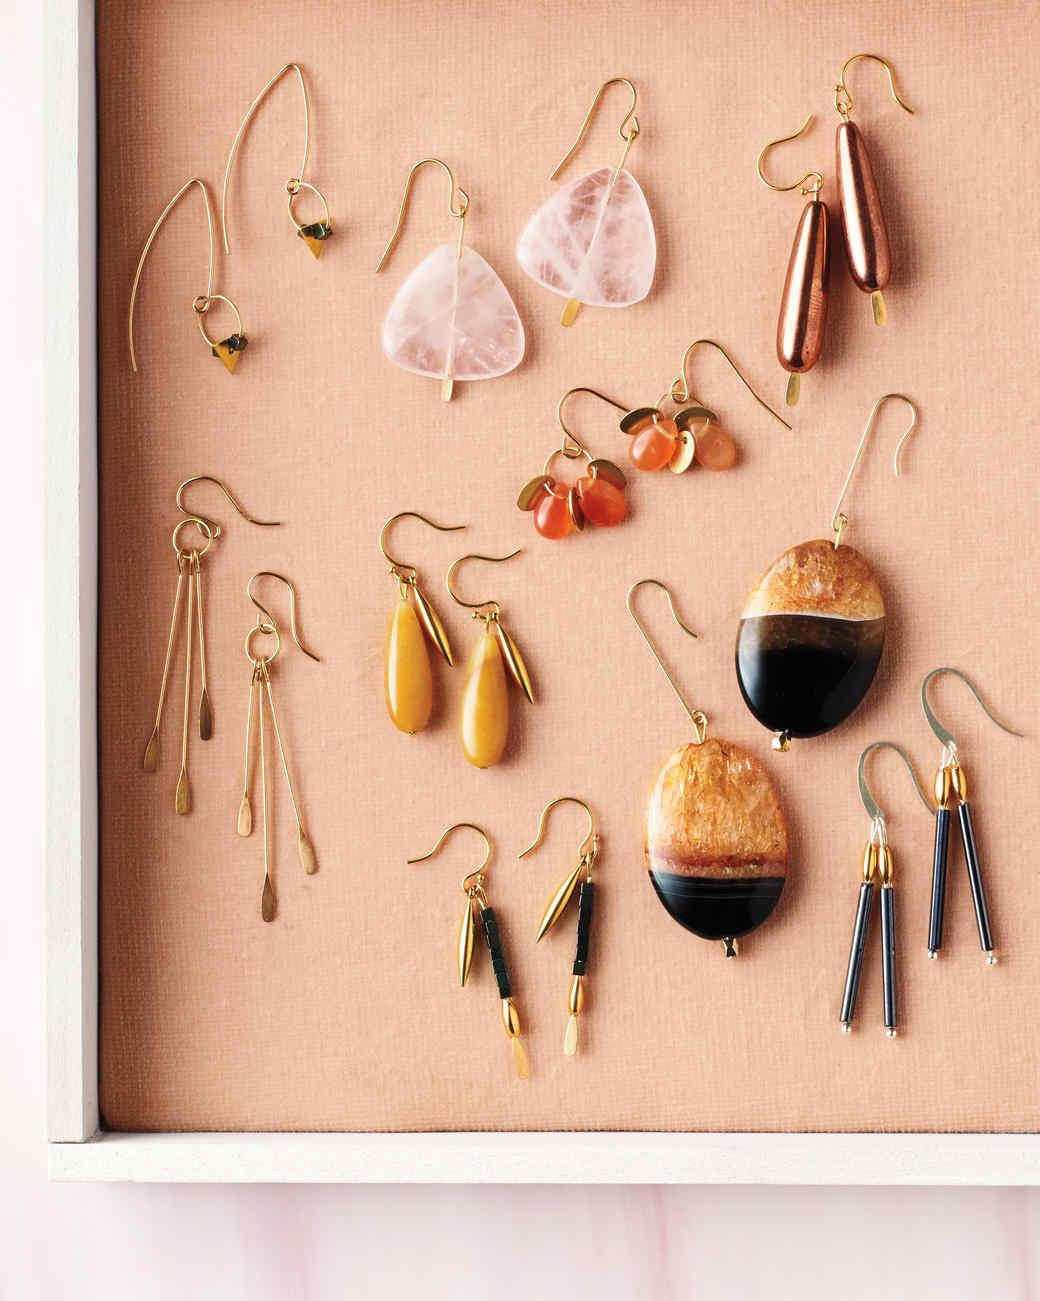 composition-of-earrings-05826-041-main-d111234-r.jpg